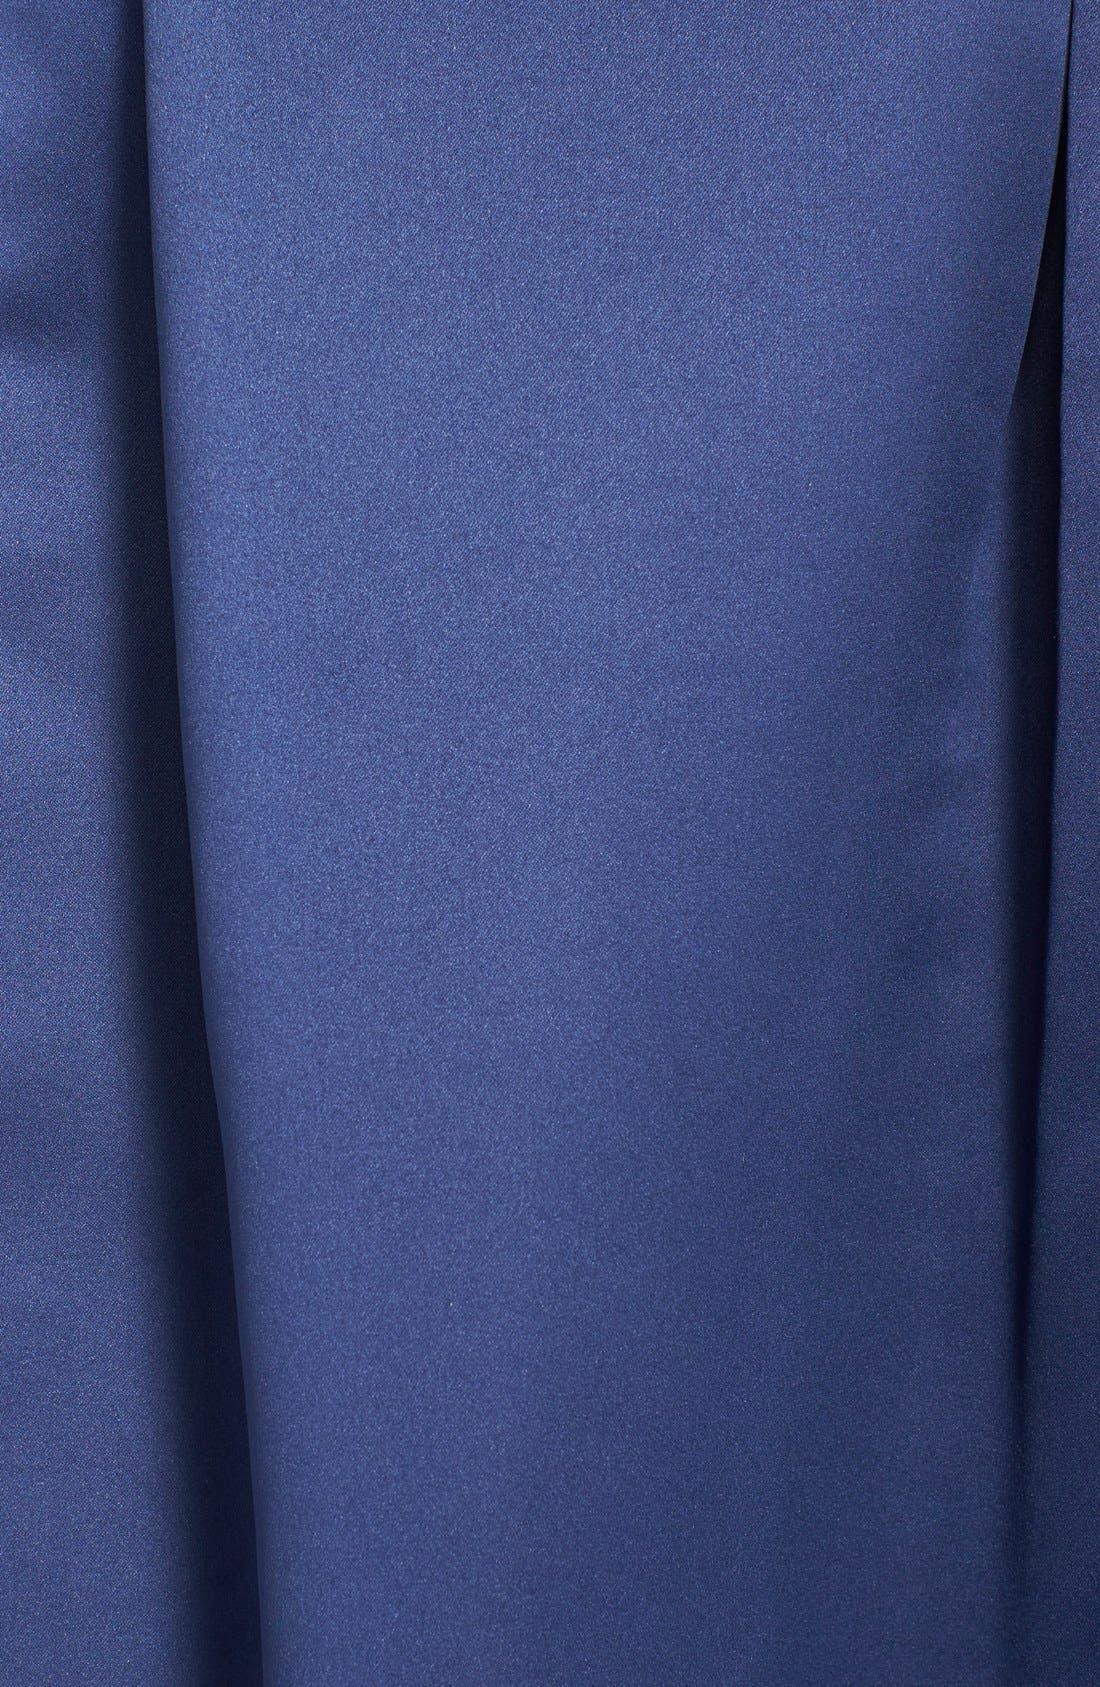 Alternate Image 4  - ERIN erin fetherston 'Jacqueline' Peau de Soie Ball Skirt